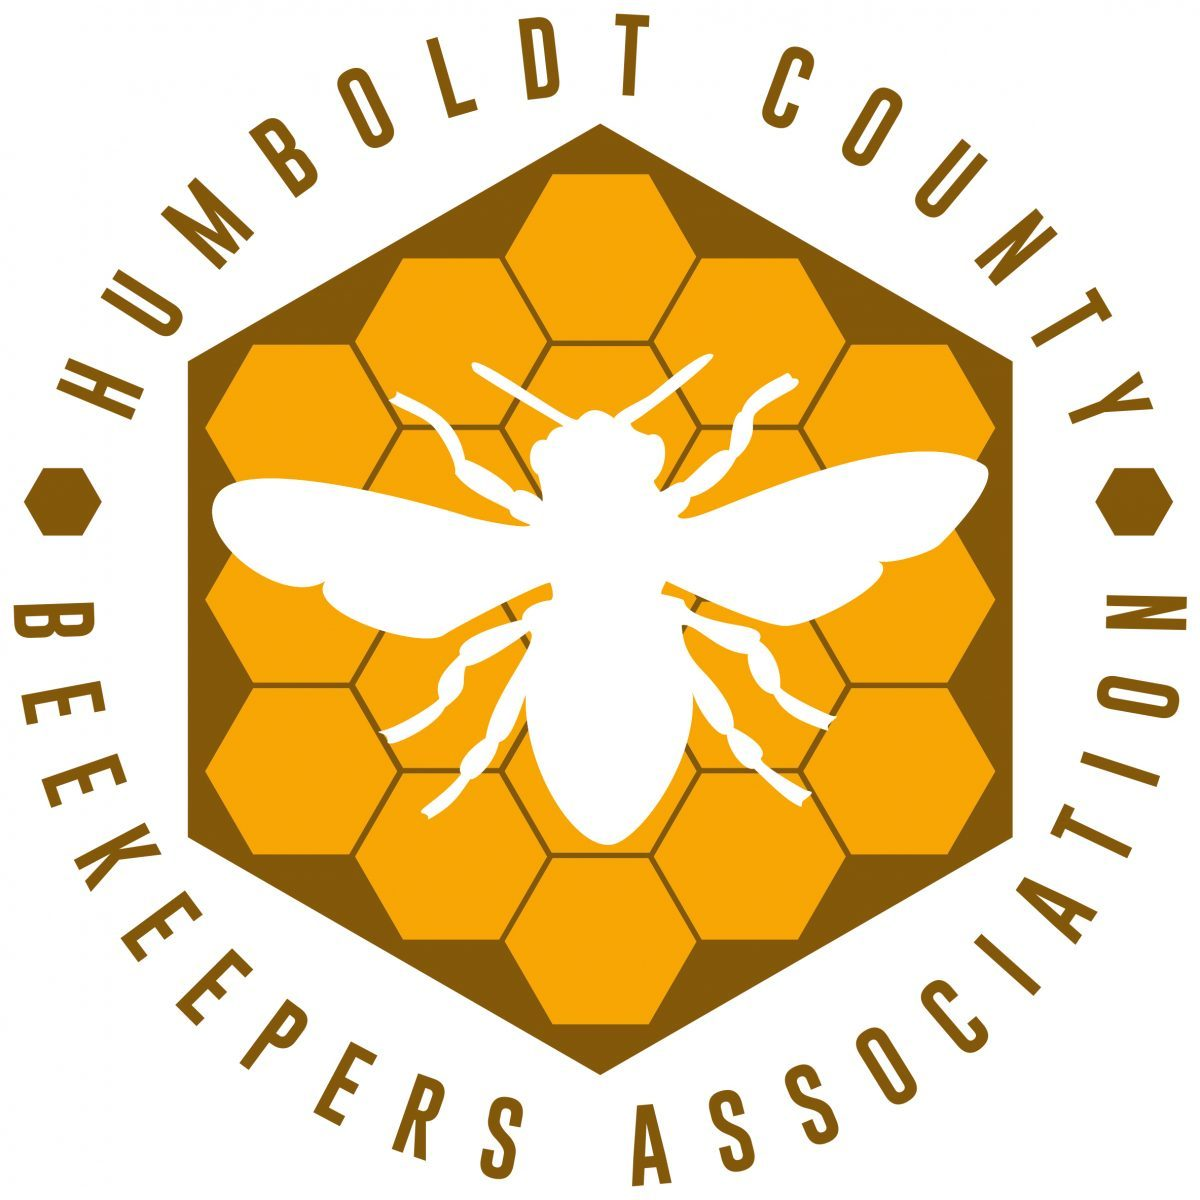 Humboldt County Beekeepers Association